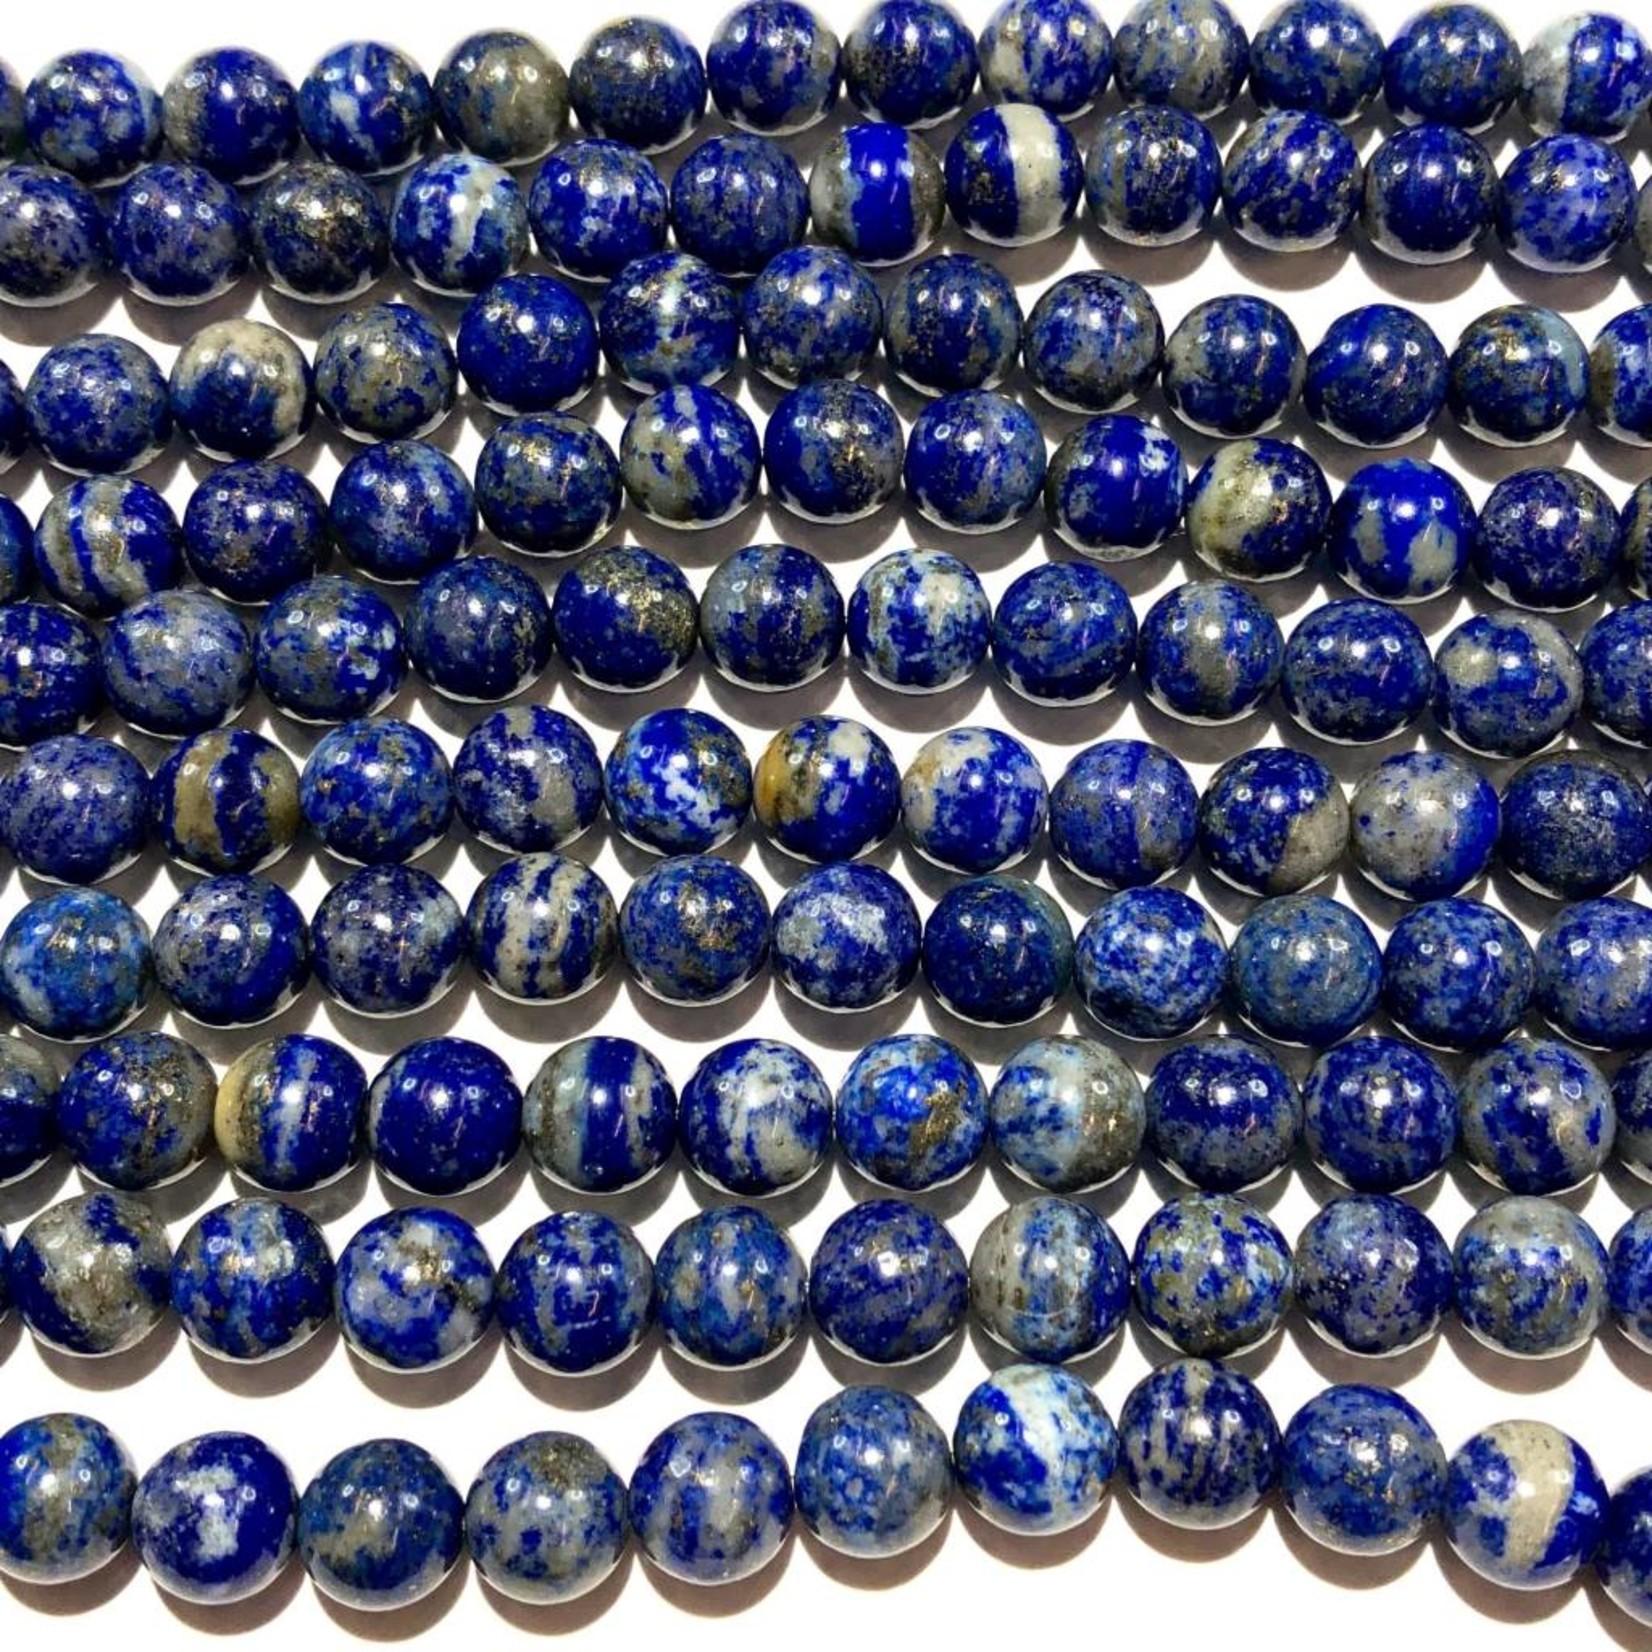 Natural UNDYED Lapis Lazuli Grade B 8mm Round